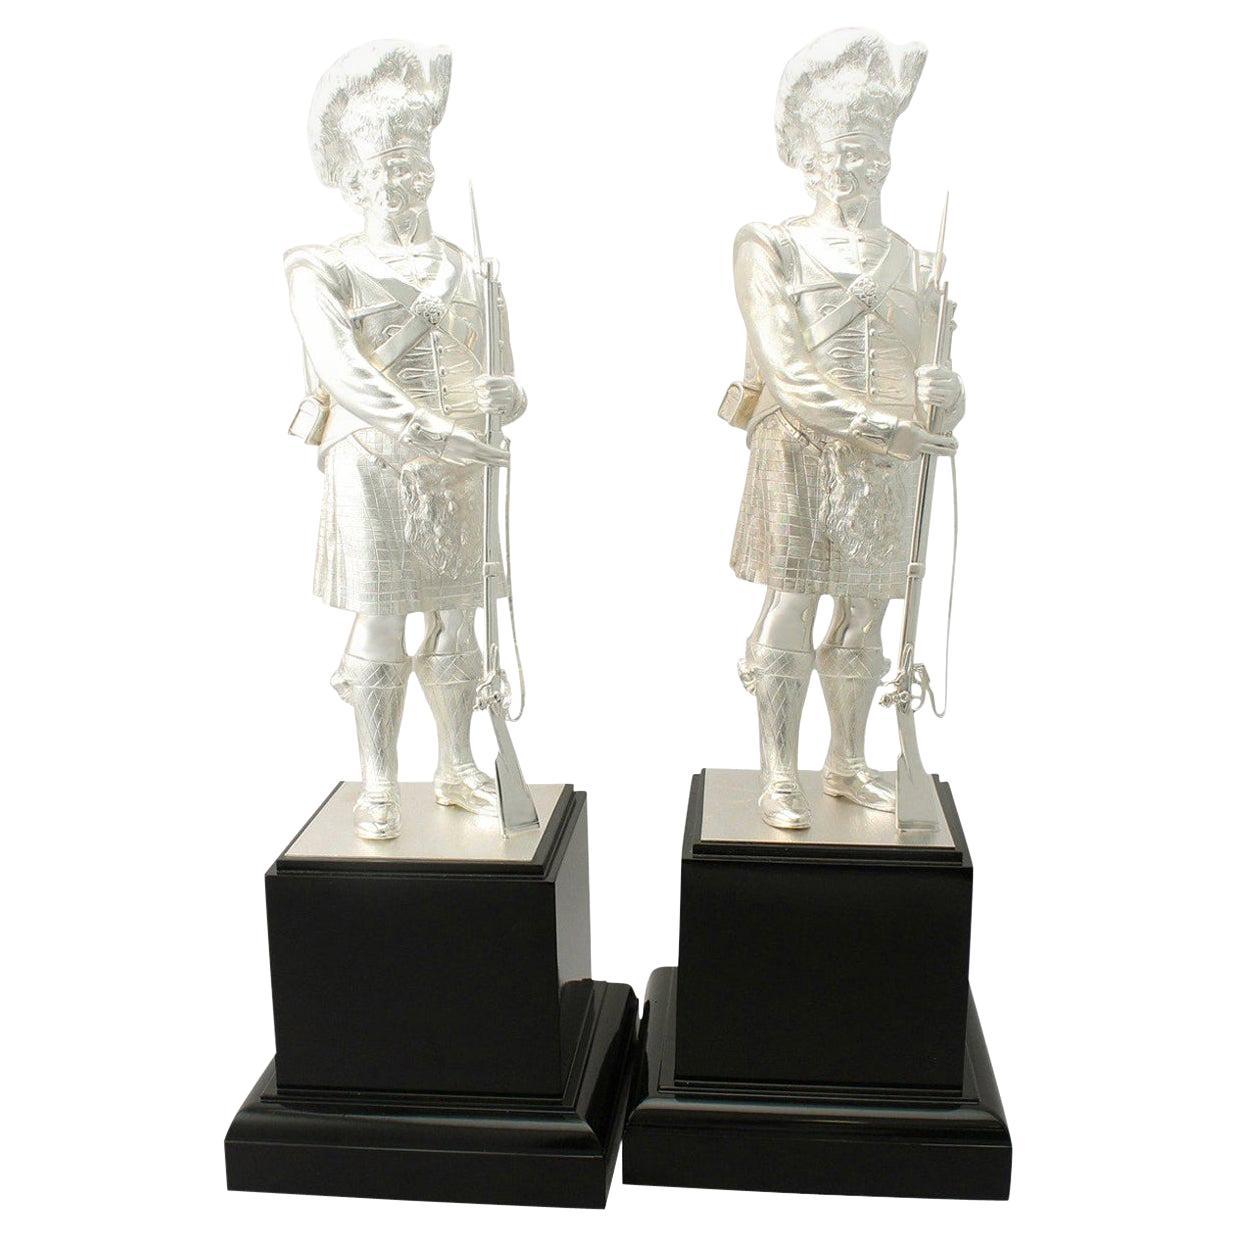 English Sterling Silver 'Gordon Highlanders' Table Ornaments